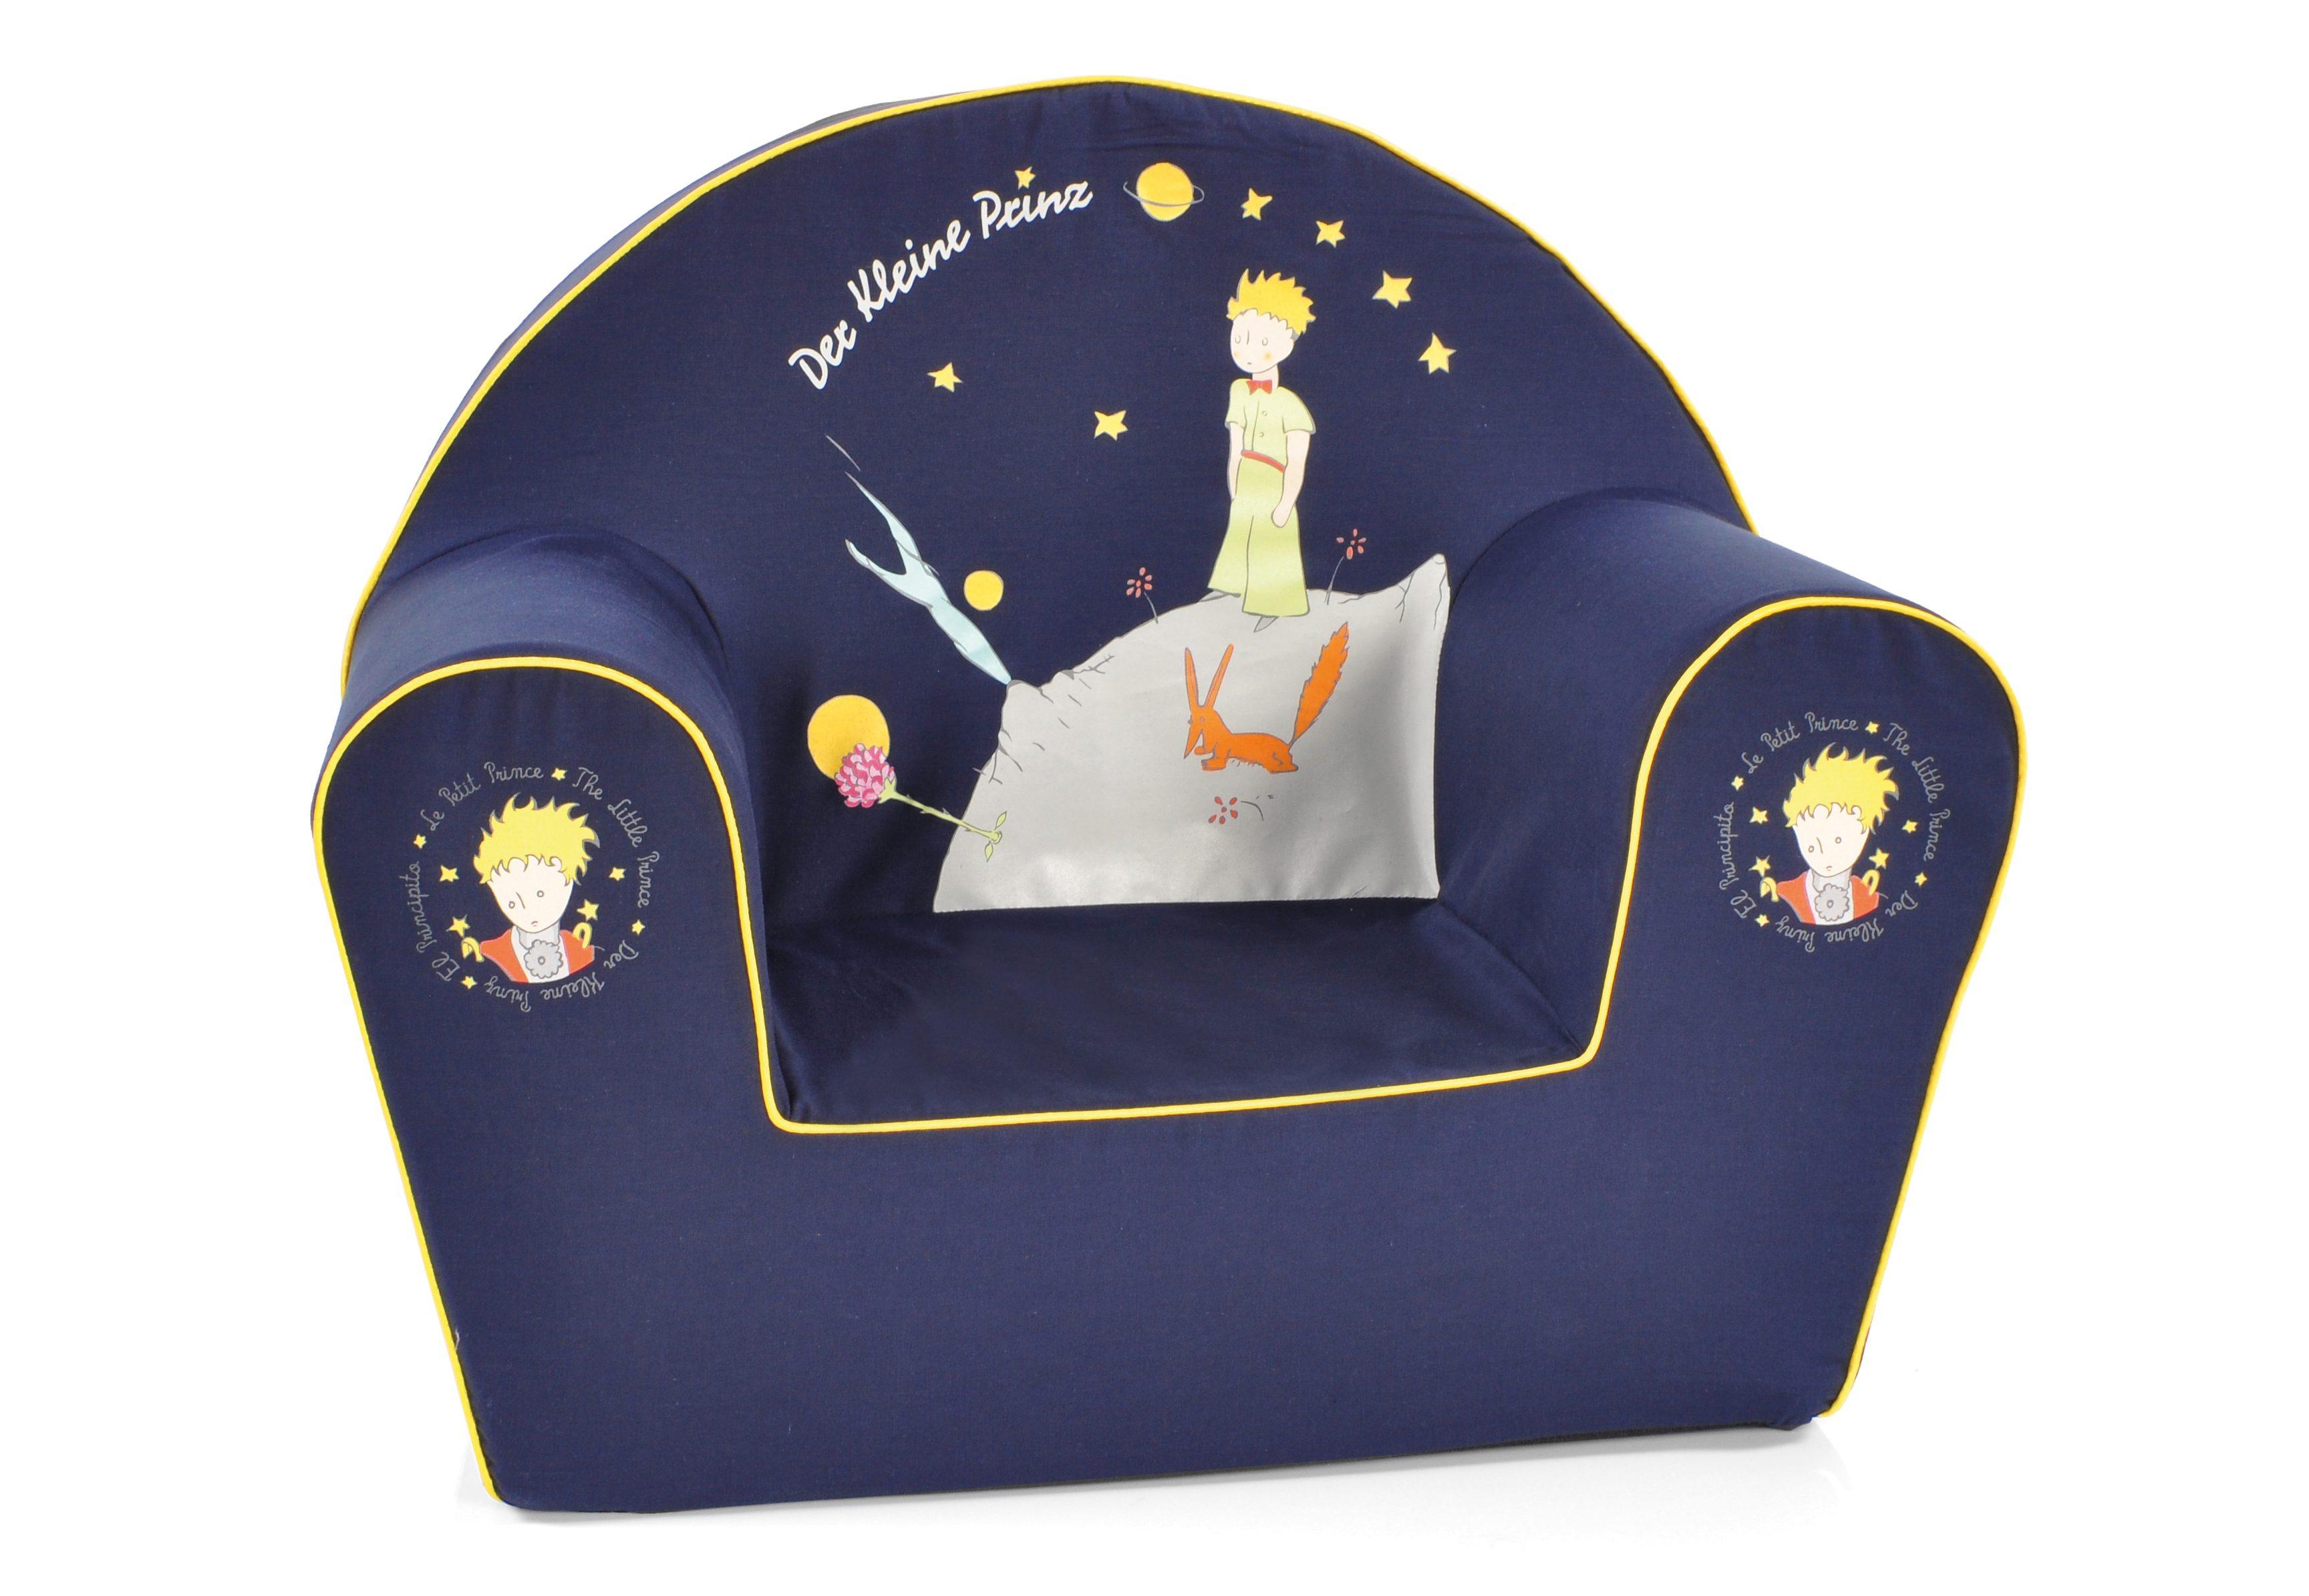 Kindersessel, »Der kleine Prinz«, knorr toys